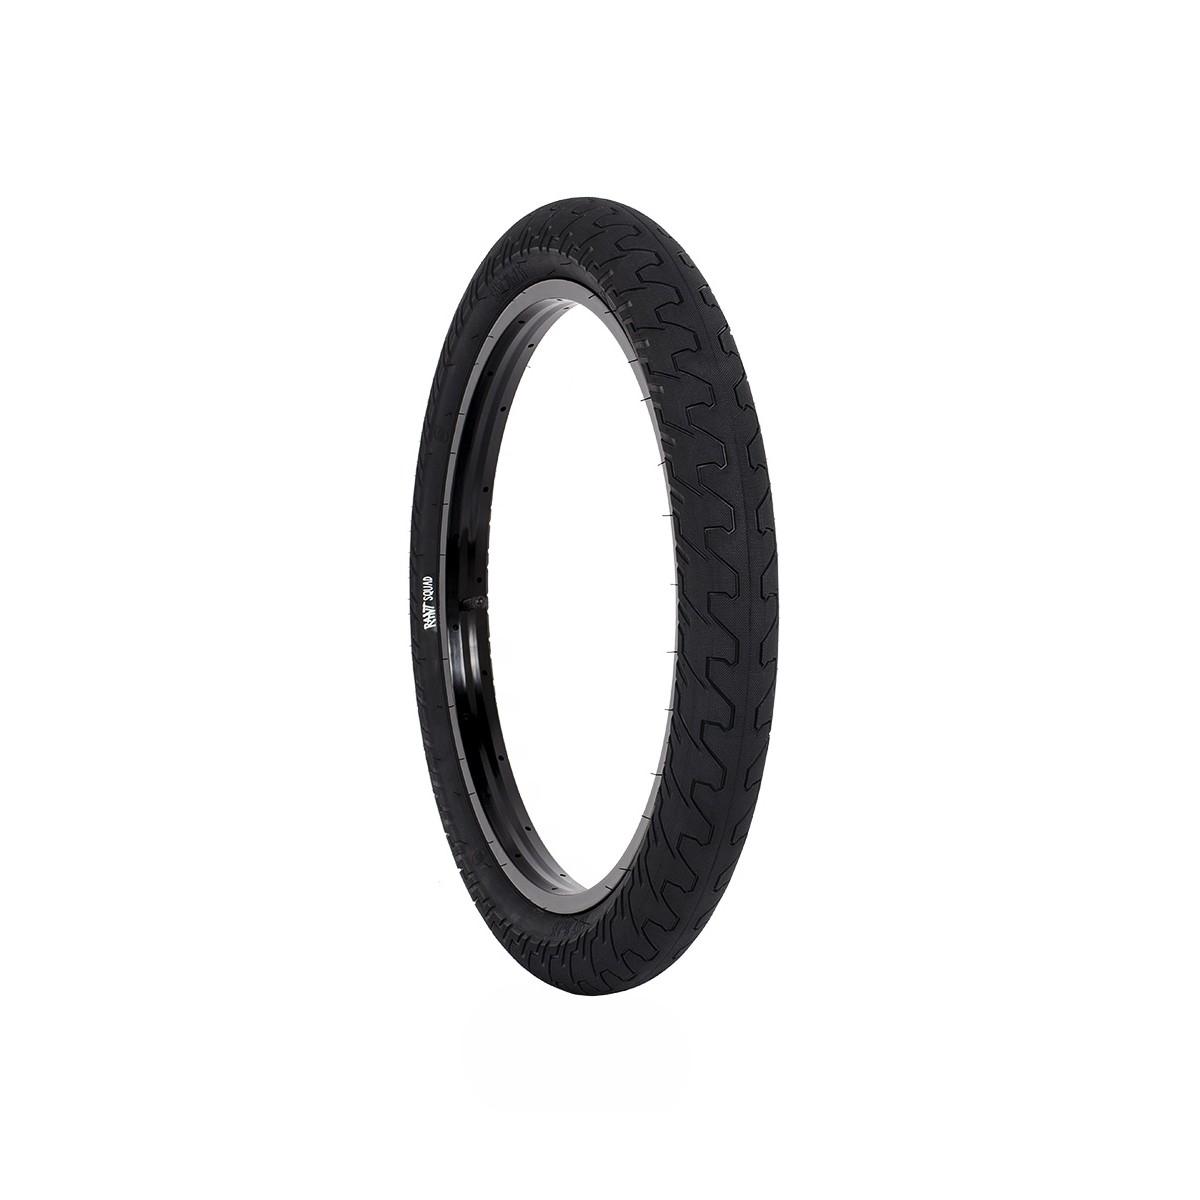 Pneu BMX Rant Squad Tire 20 x 2.20 Noir